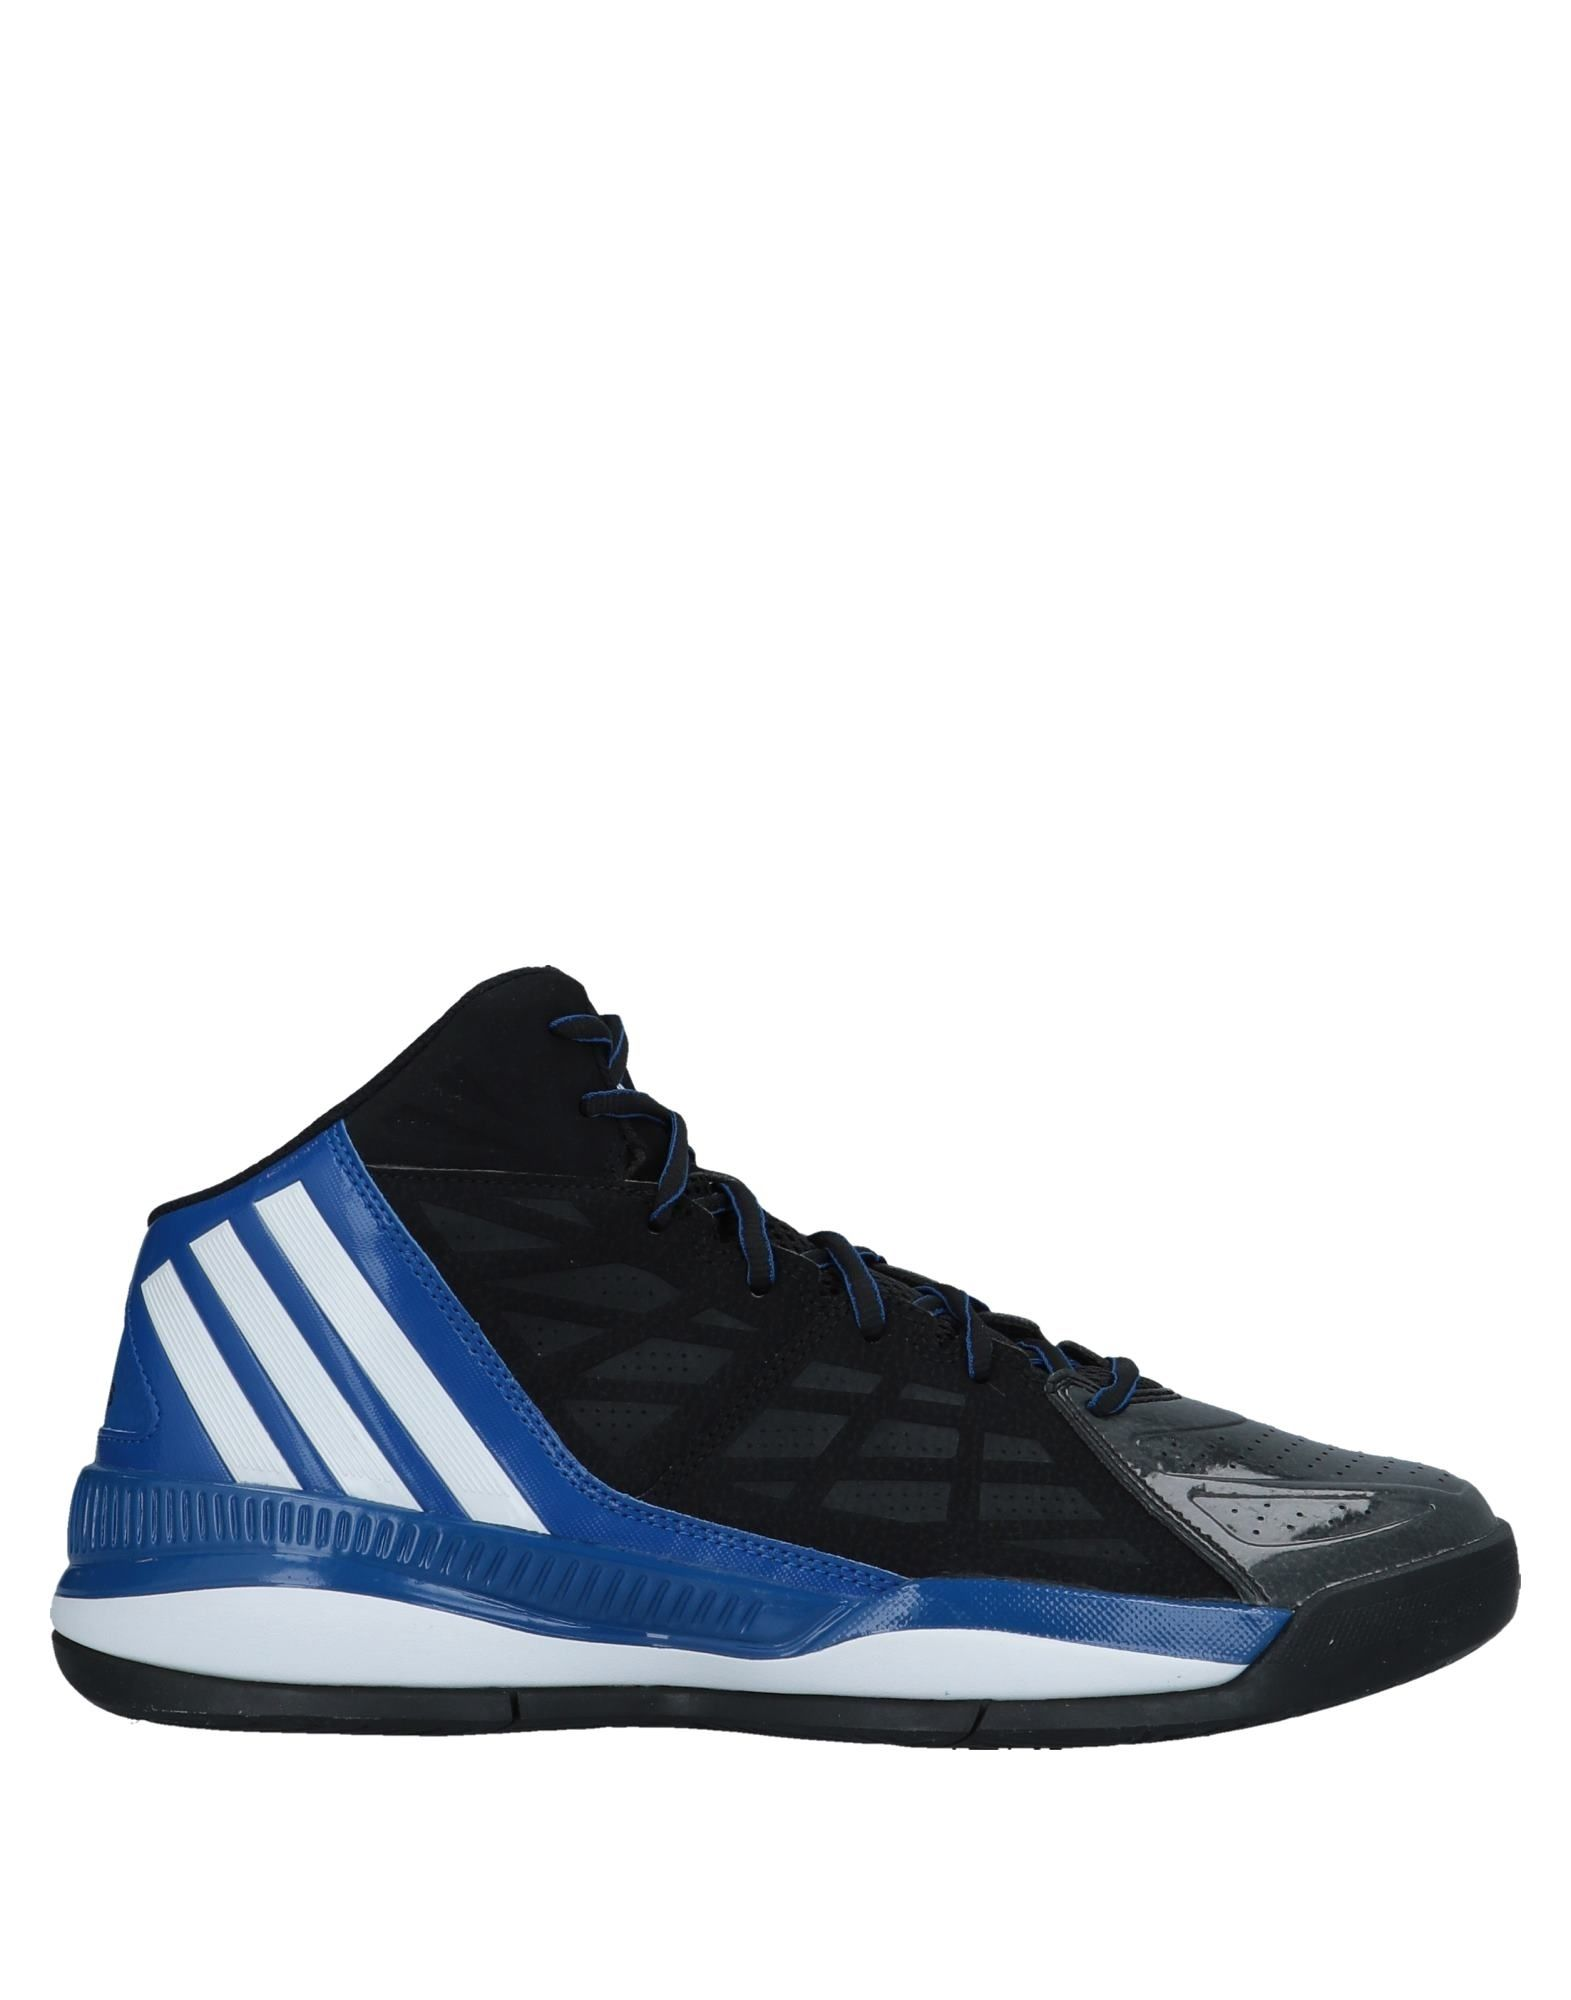 Moda Sneakers Adidas Uomo - 11519204PK